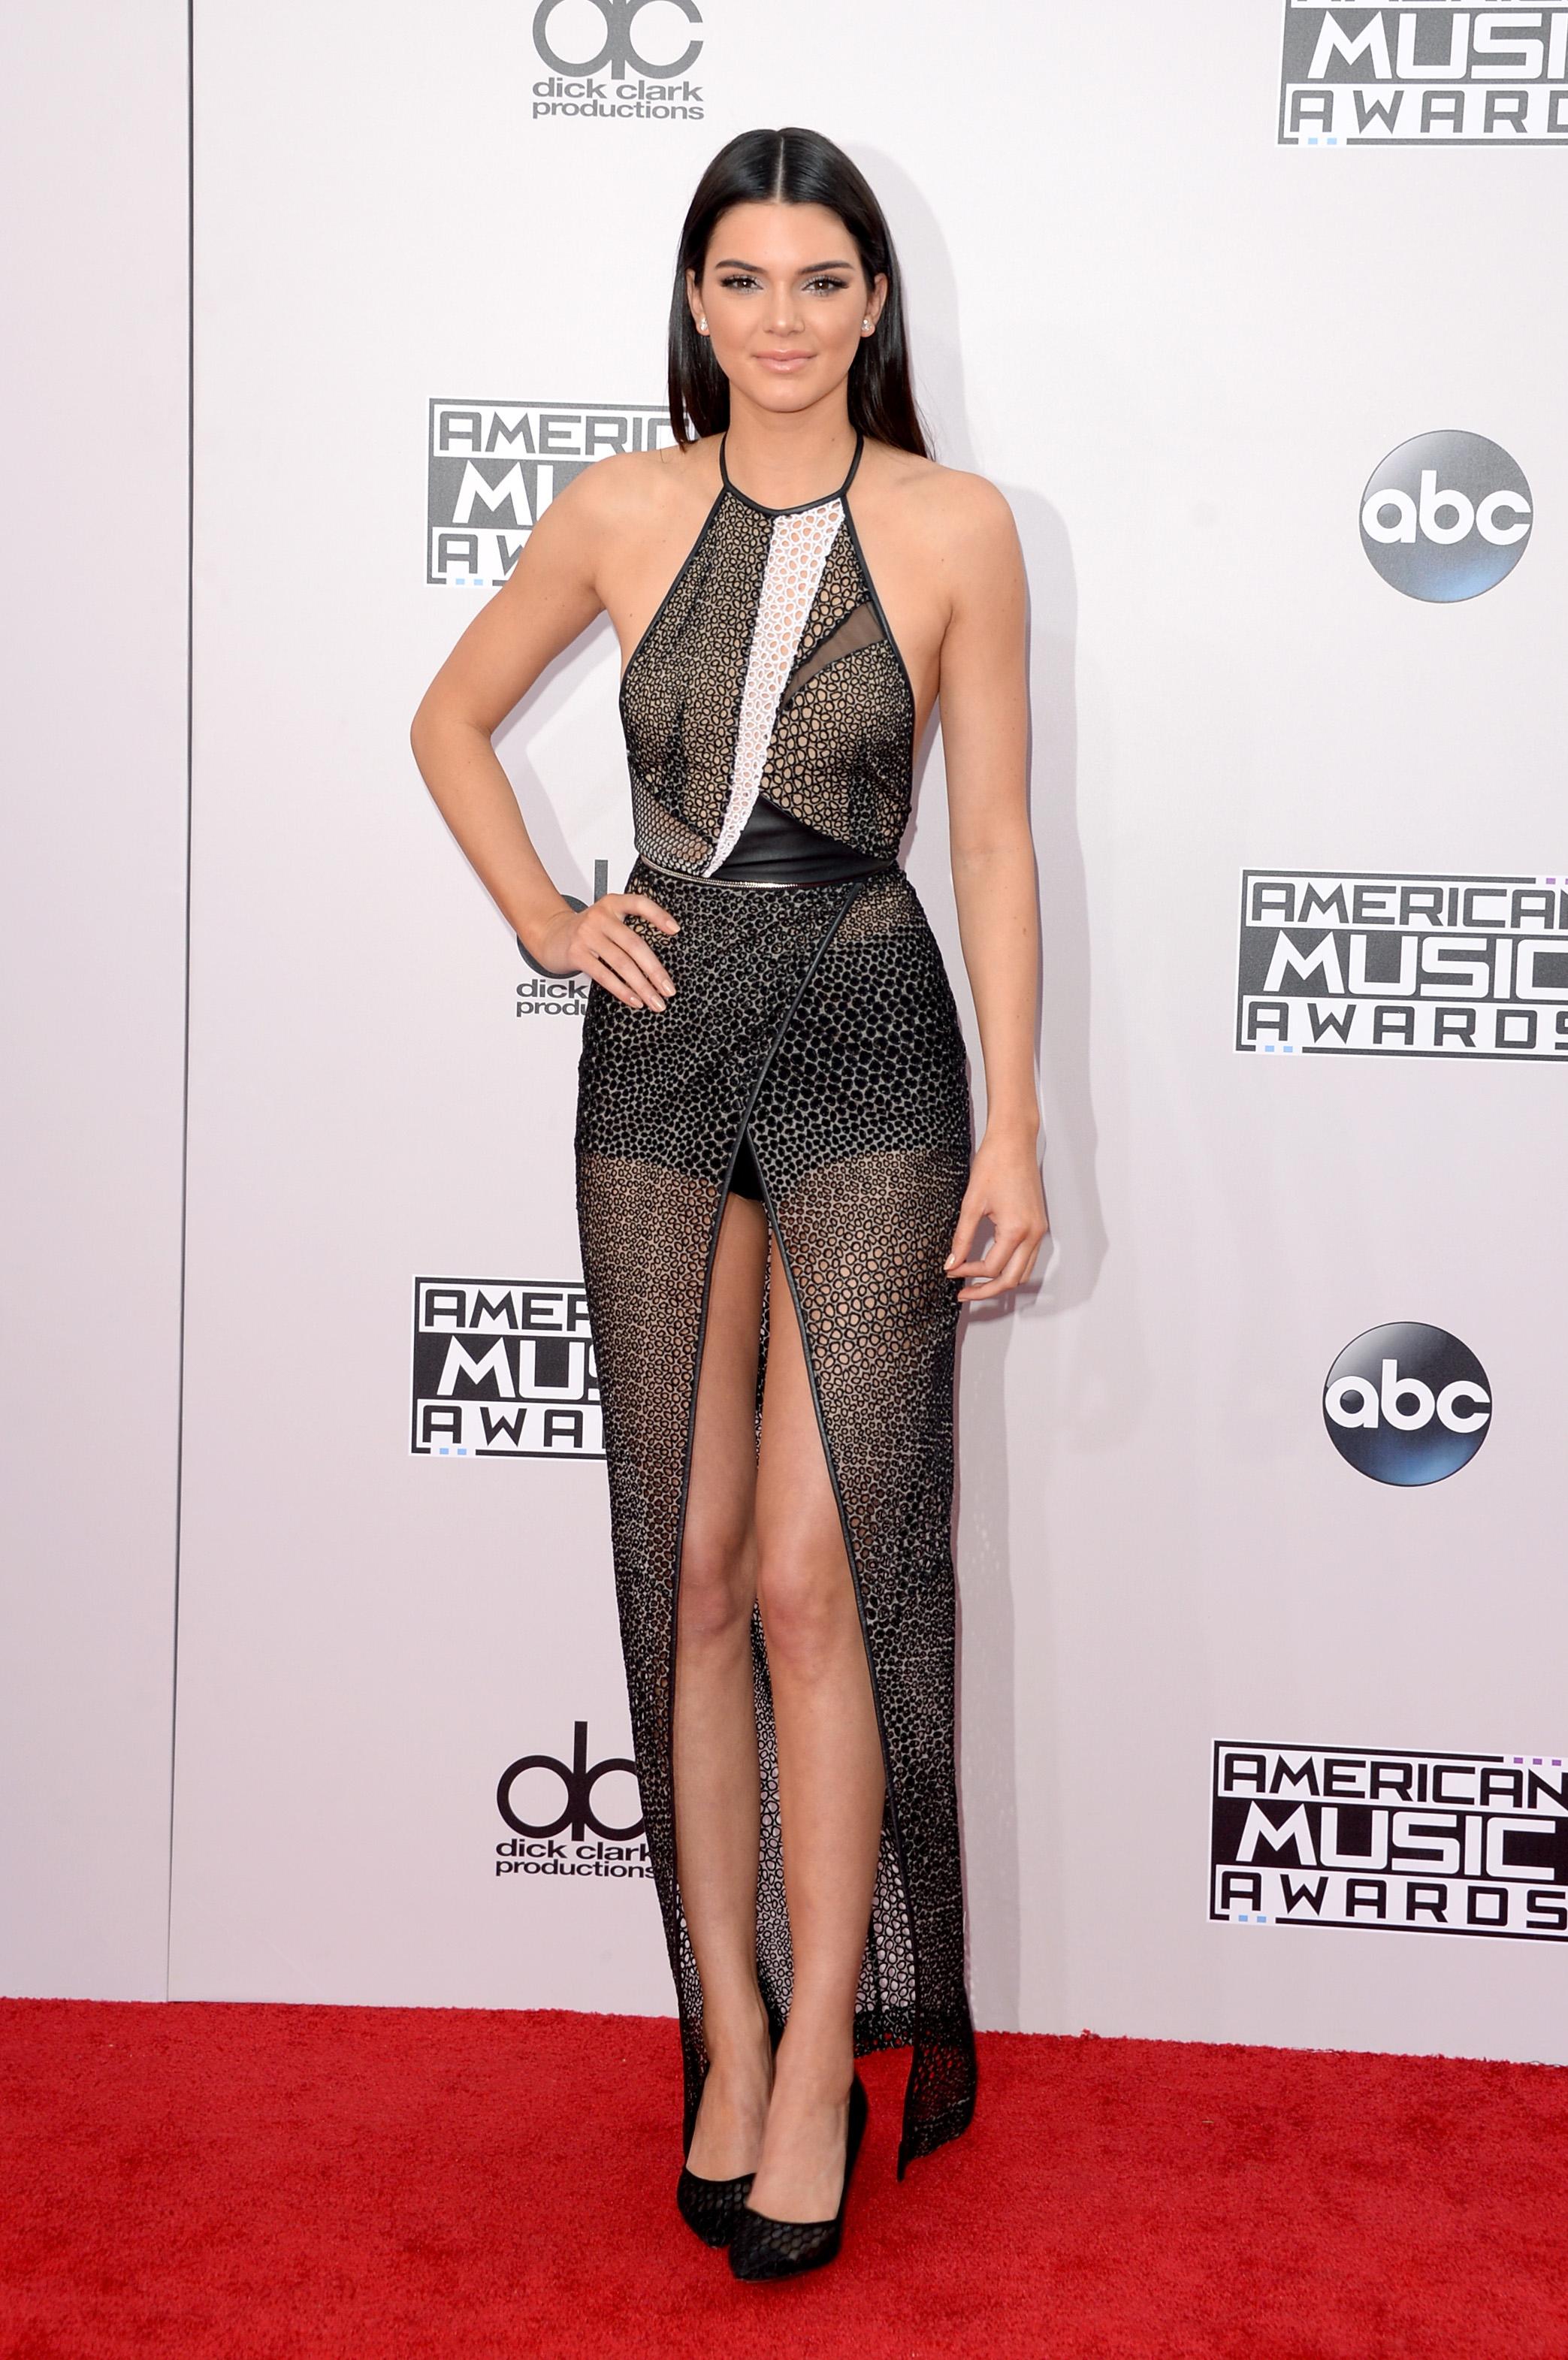 Kendall Jenner: 'I feel like a grew up too fast'